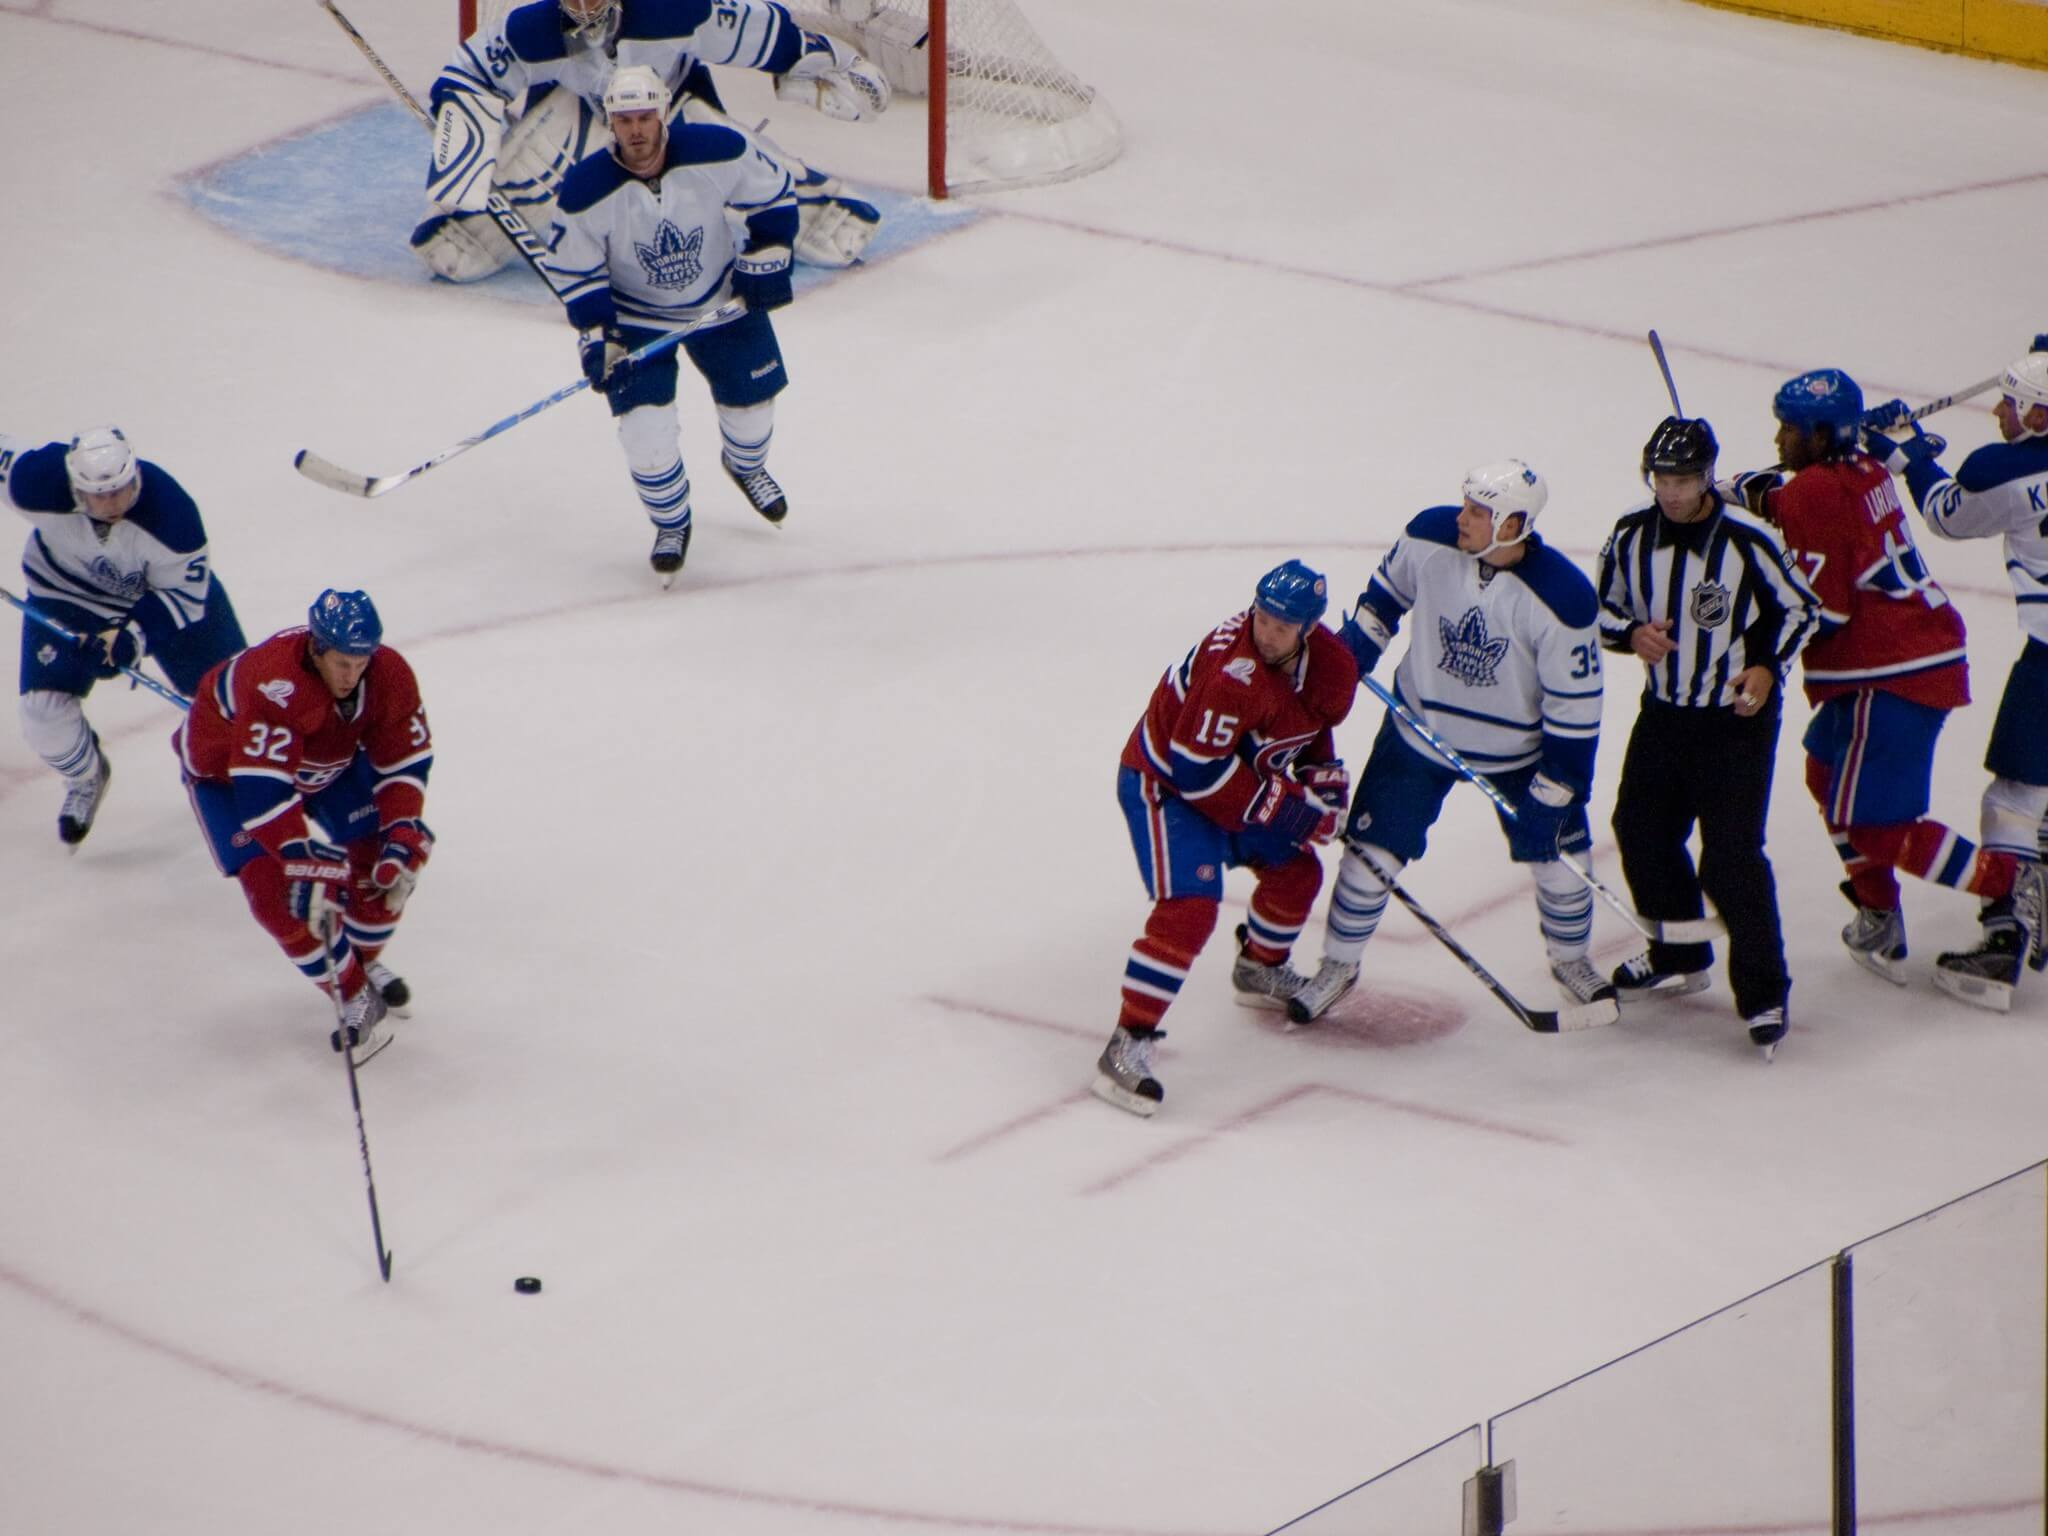 Montreal Canadiens vs Toronto Maple Leafs NHL hockey rivalry